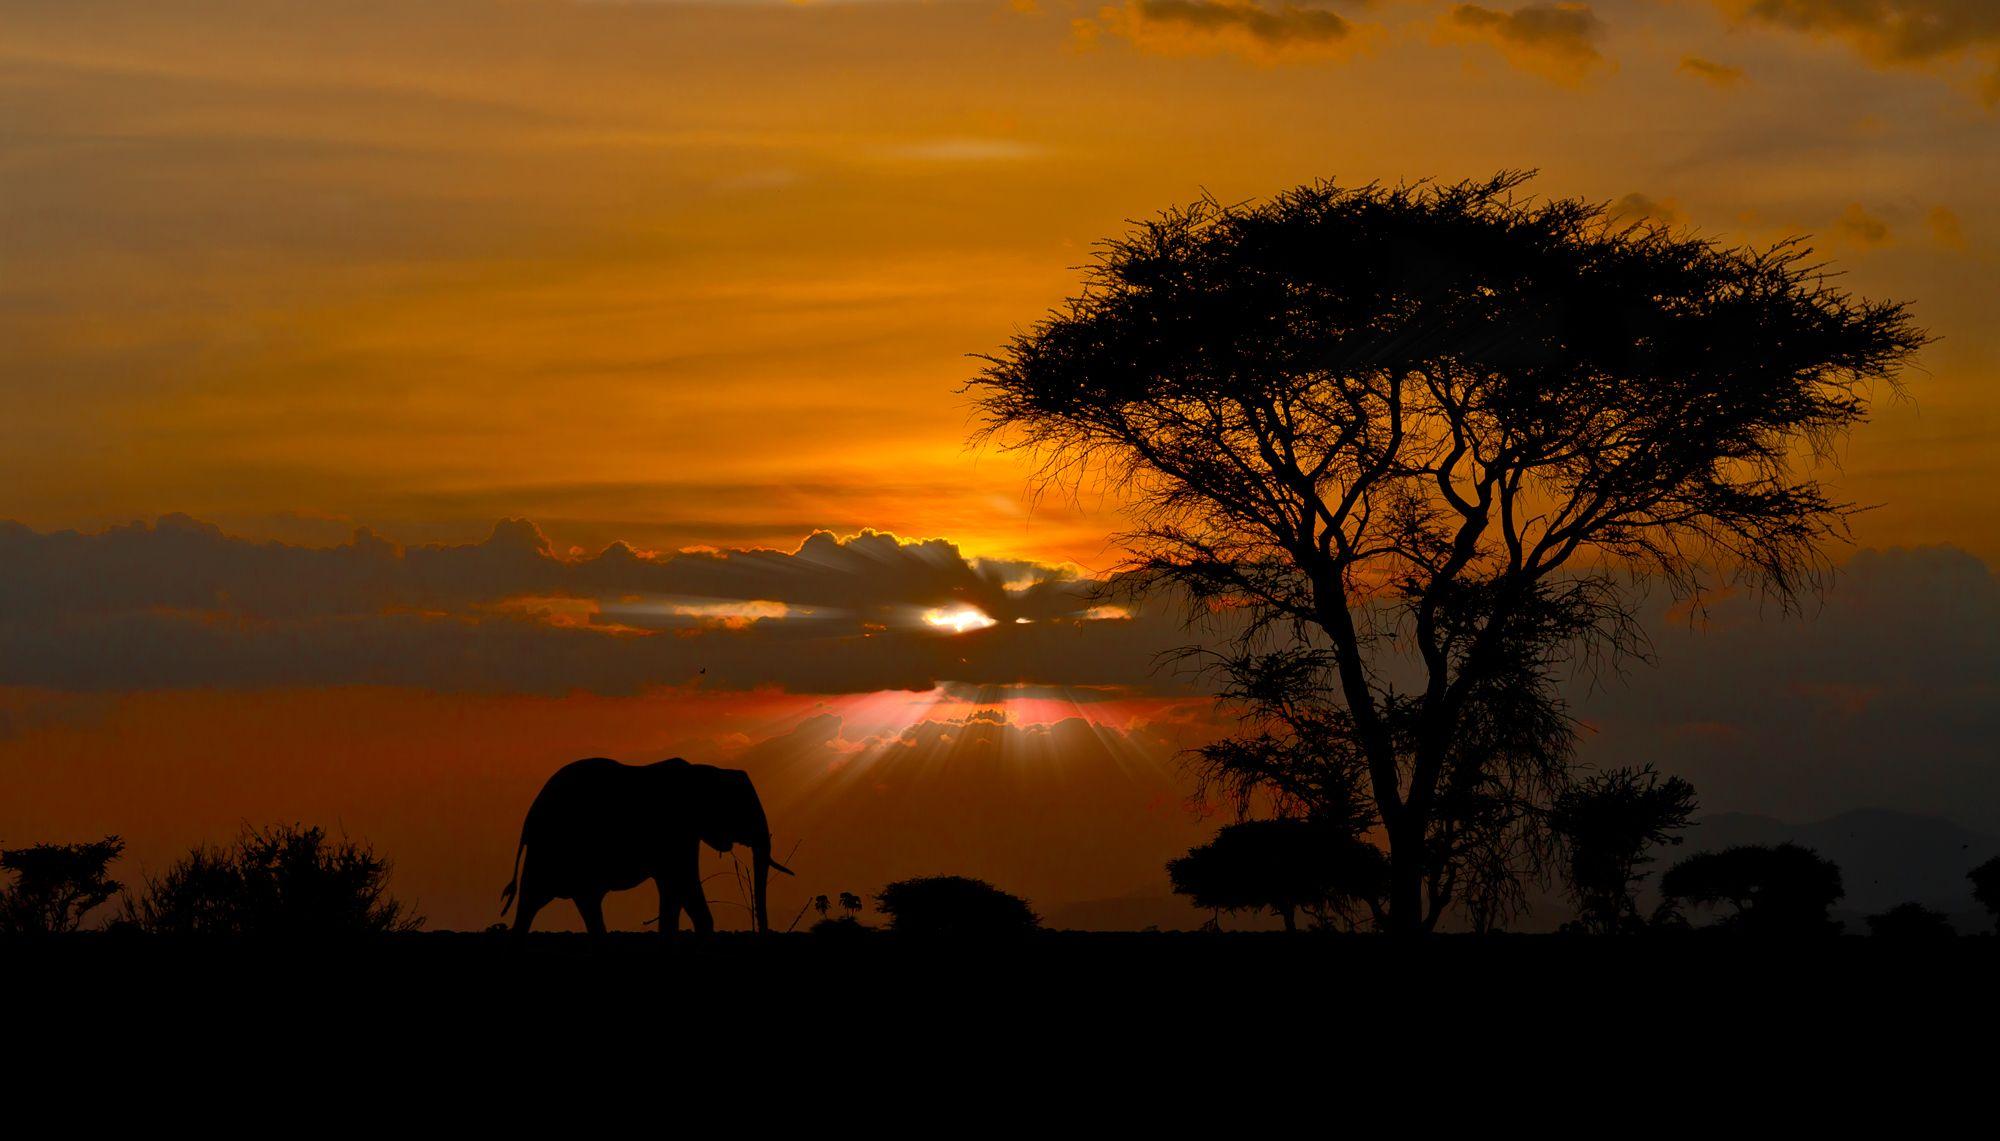 African Landscape Sunset - Nature Wallpapers (9237) ilikewalls.